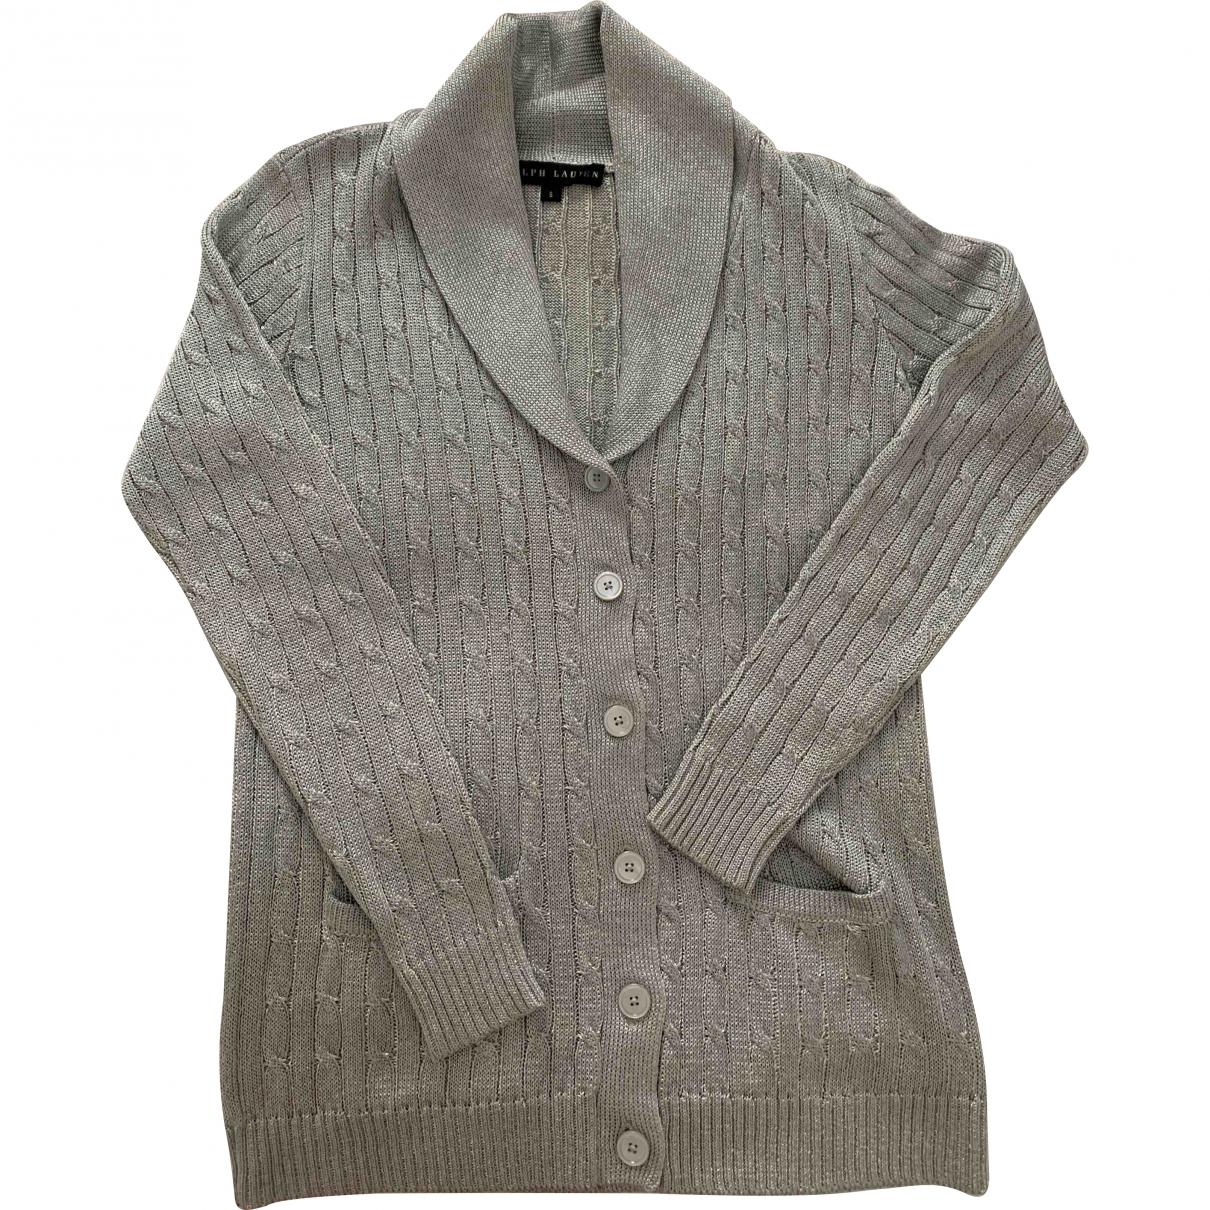 Ralph Lauren \N Metallic Cotton Knitwear for Women S